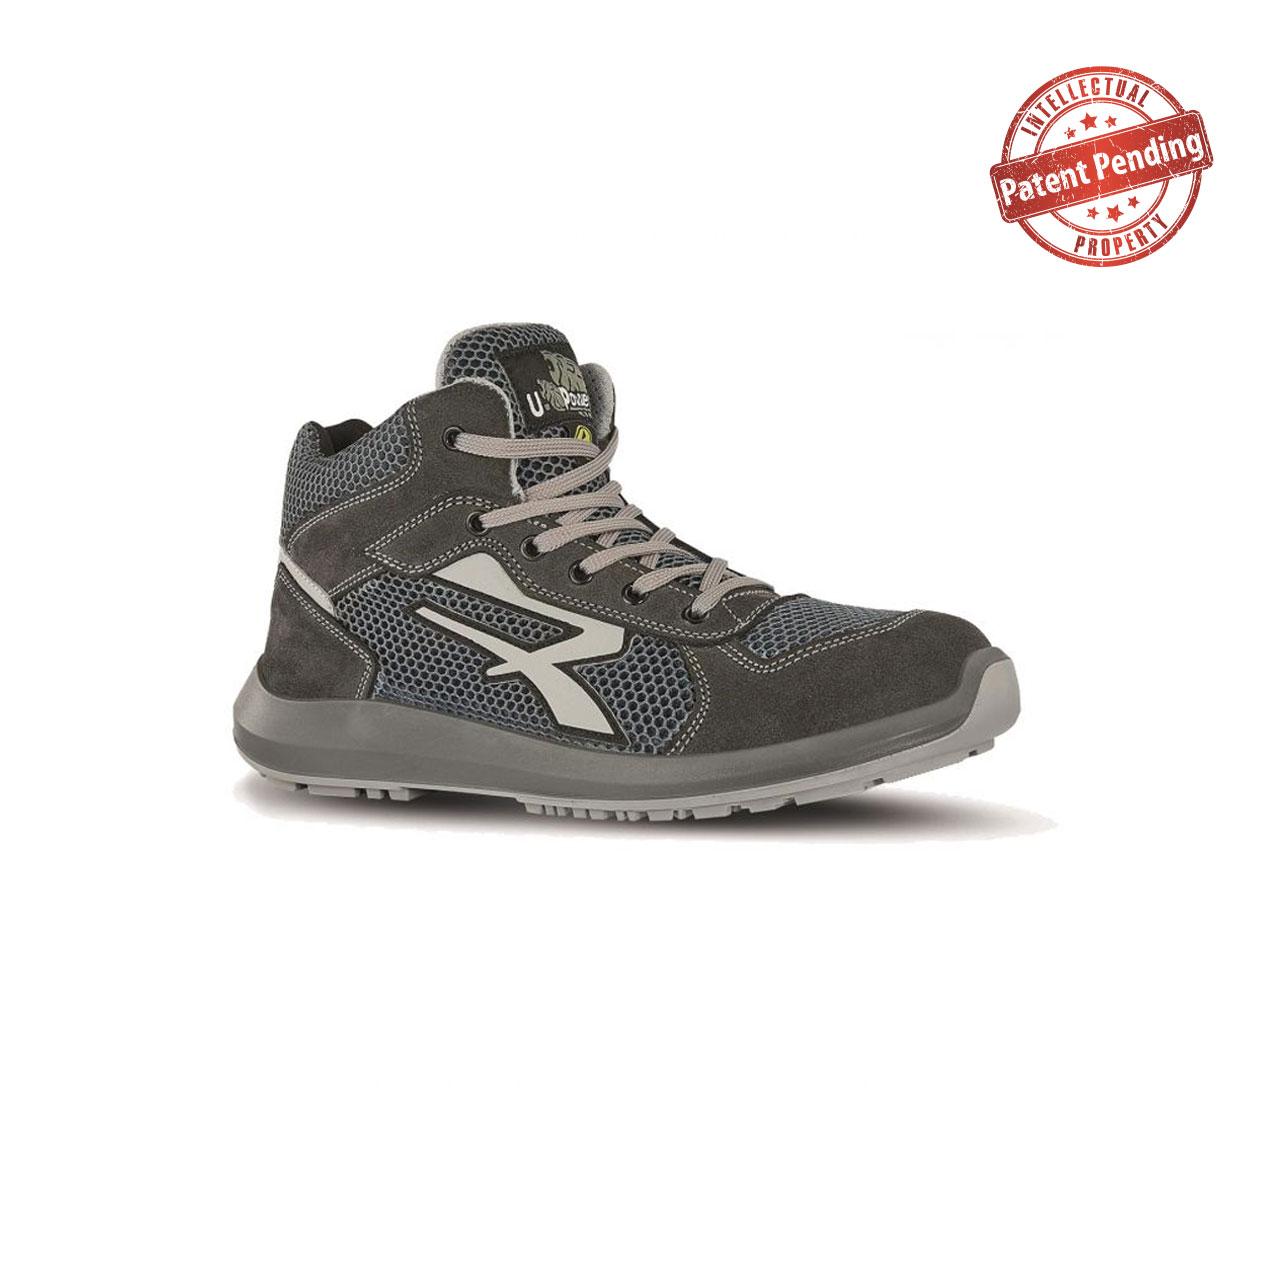 scarpa antinfortunistica alta upower modello atos linea dexter vista laterale